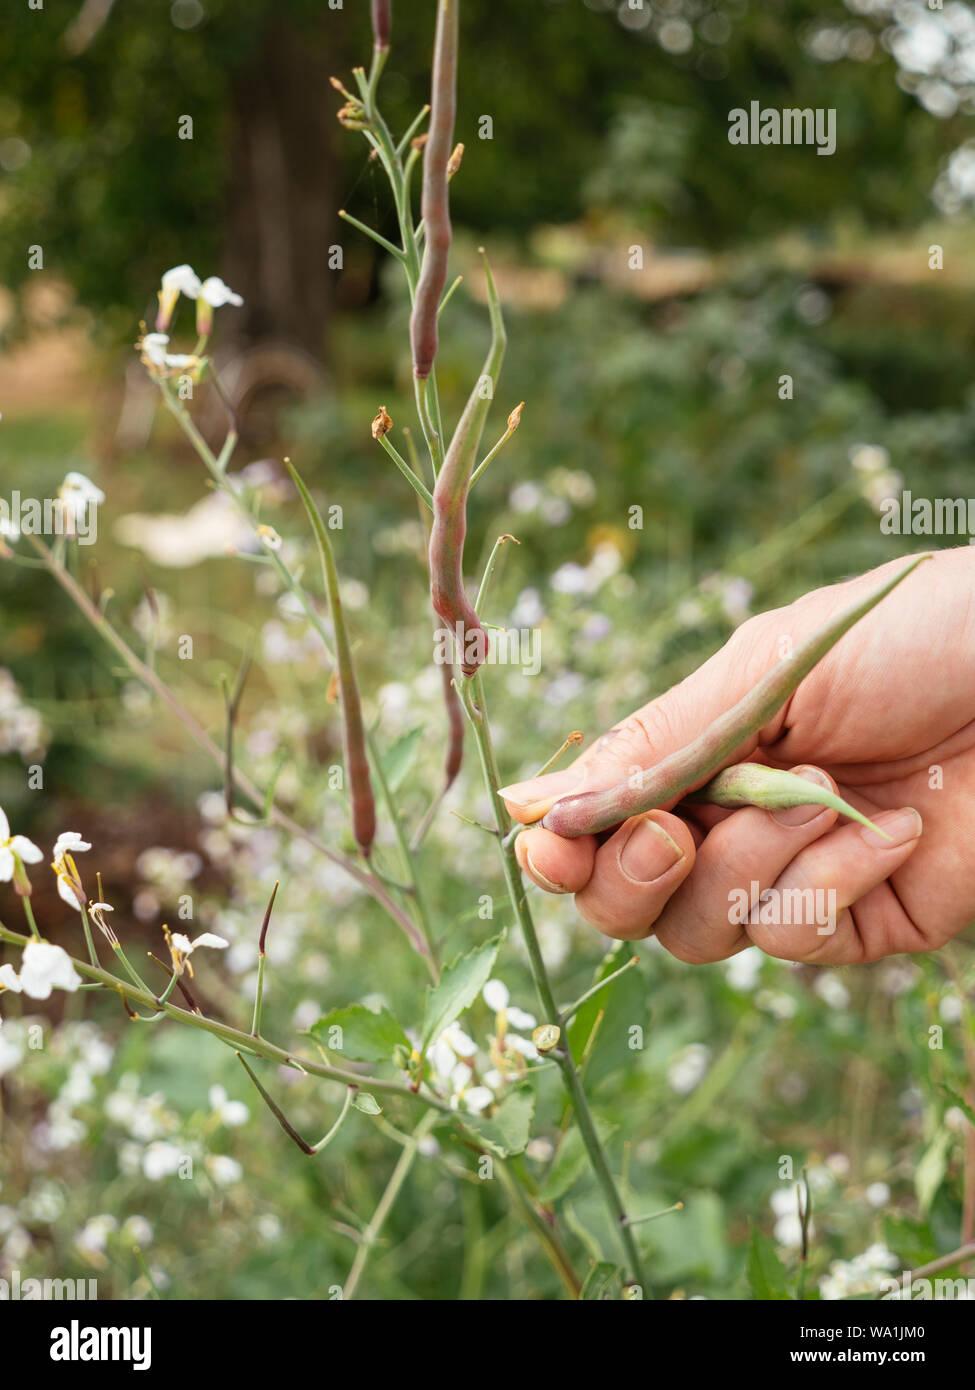 Gardener harvesting rat-tail radish (Raphanus sativus var. mougri) pods. Stock Photo